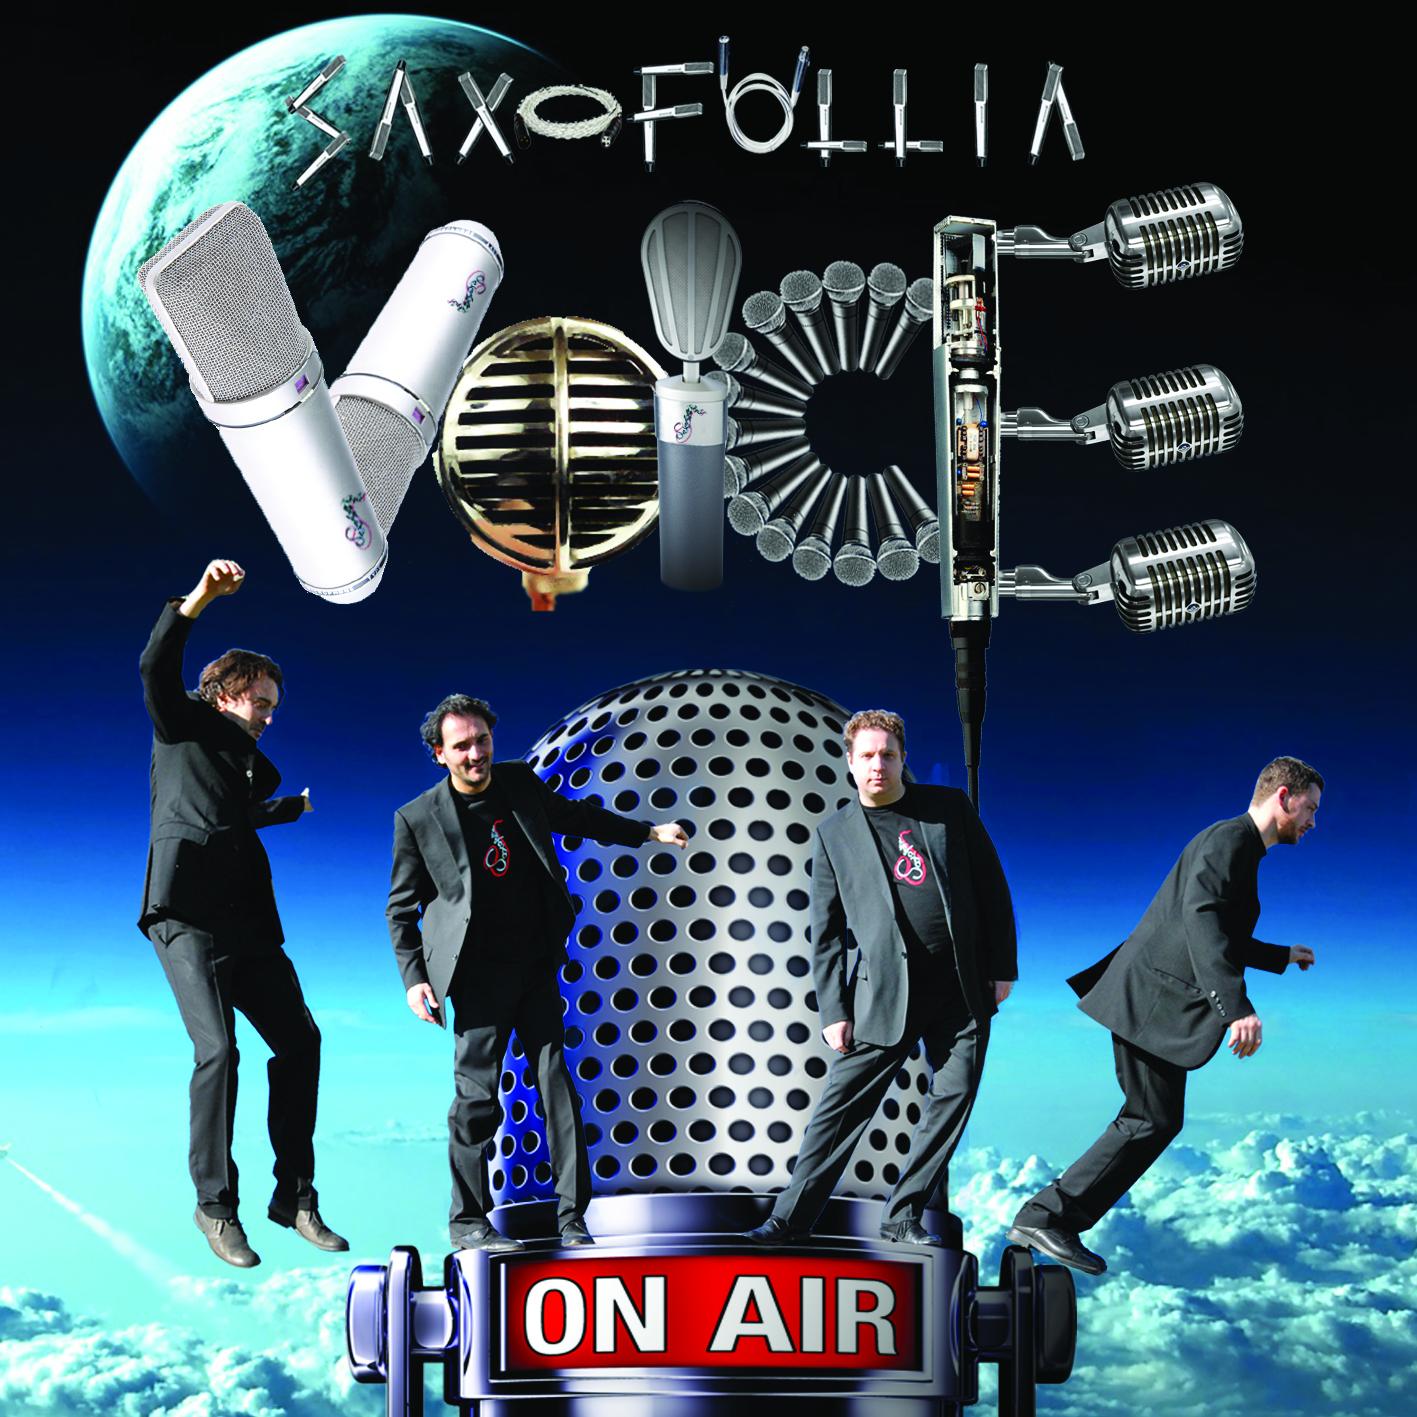 Saxofollia Voice on Air